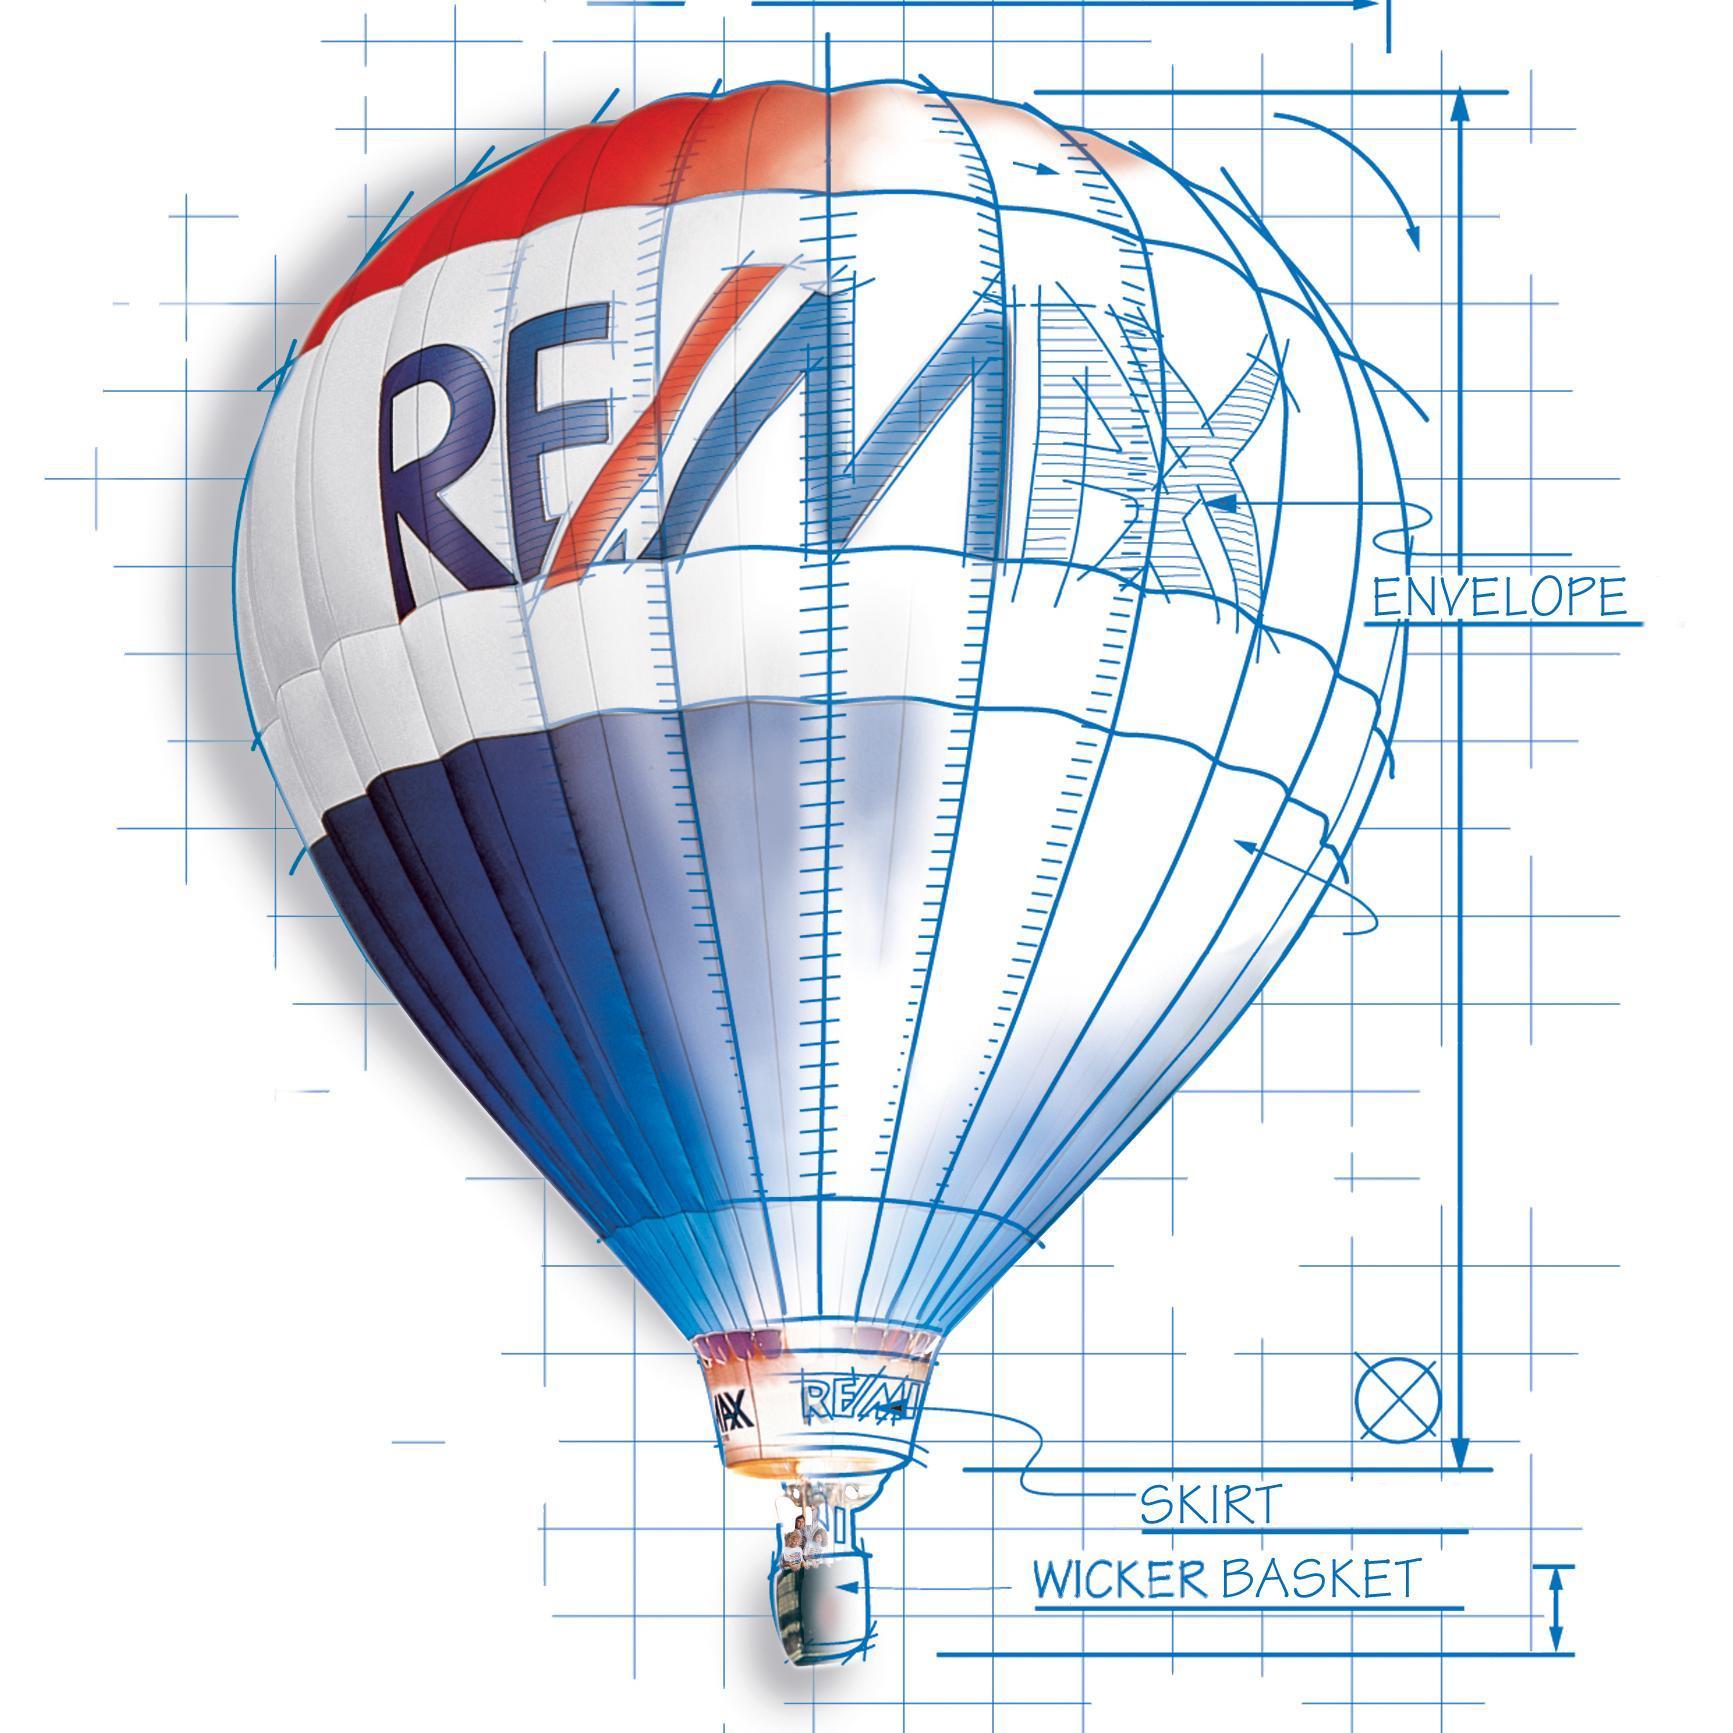 Remax blueprint remaxblueprint twitter remax blueprint malvernweather Images